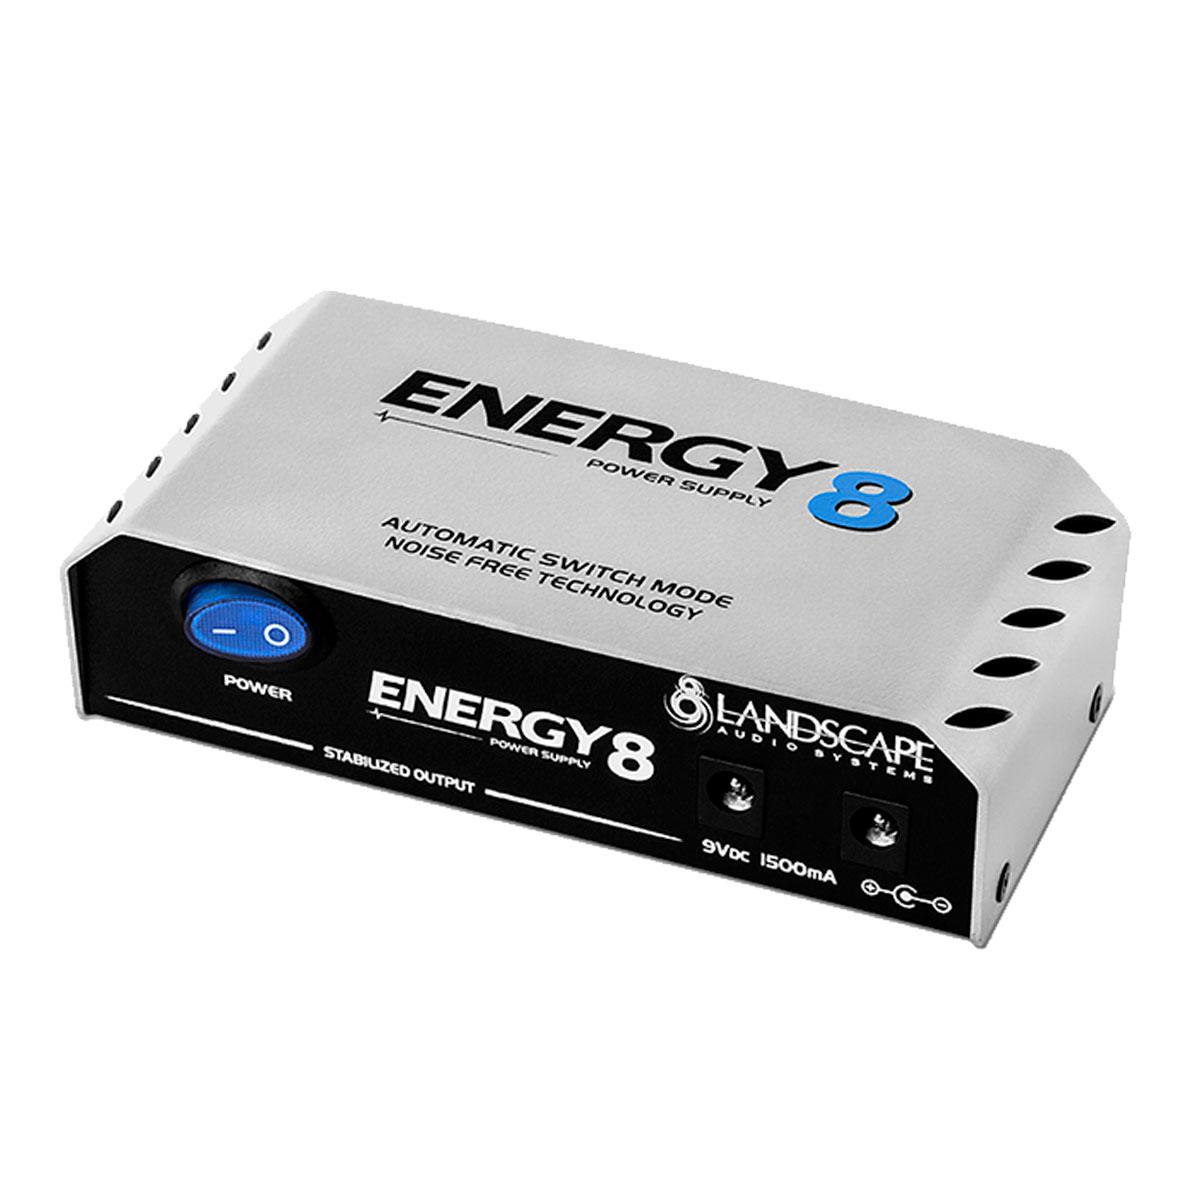 Fonte Automática de 8 Plugs 9V DC 1500mA - Energy 8 Landscape